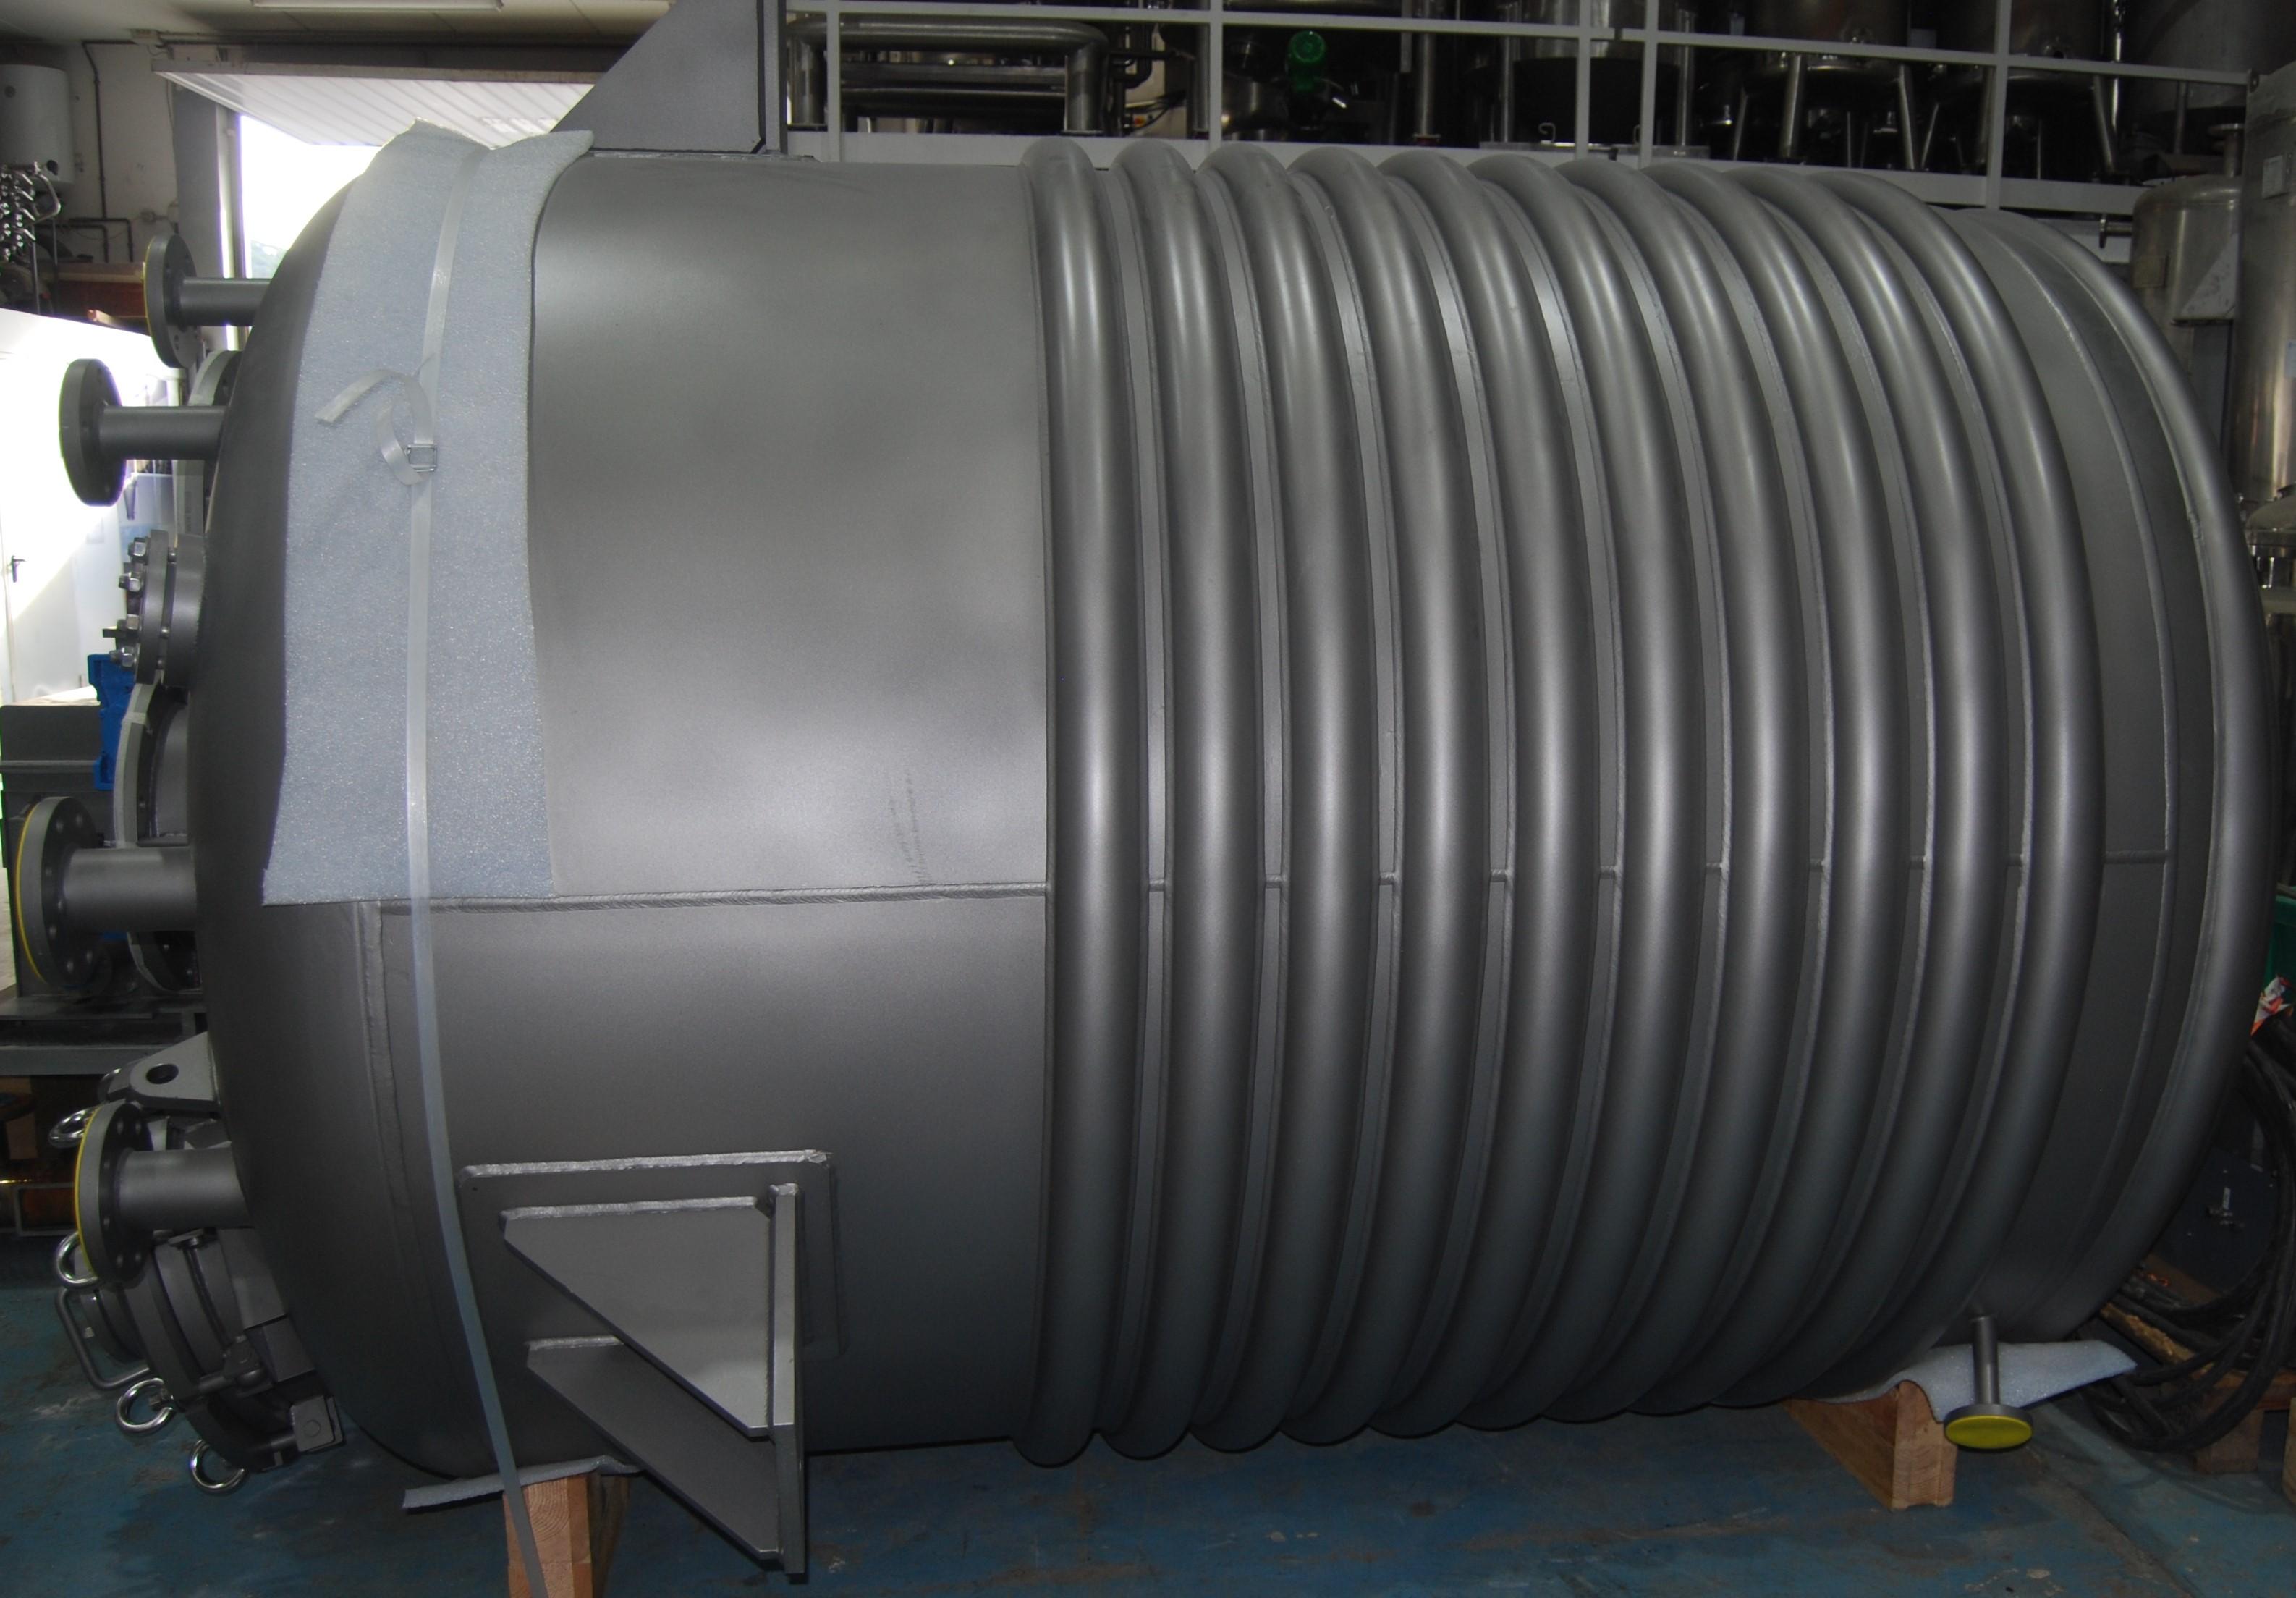 5,800 Litre, 6 Bar/Full Vacuum Internal, 10 Bar Jacket, Stainless Steel Vertical Reactor